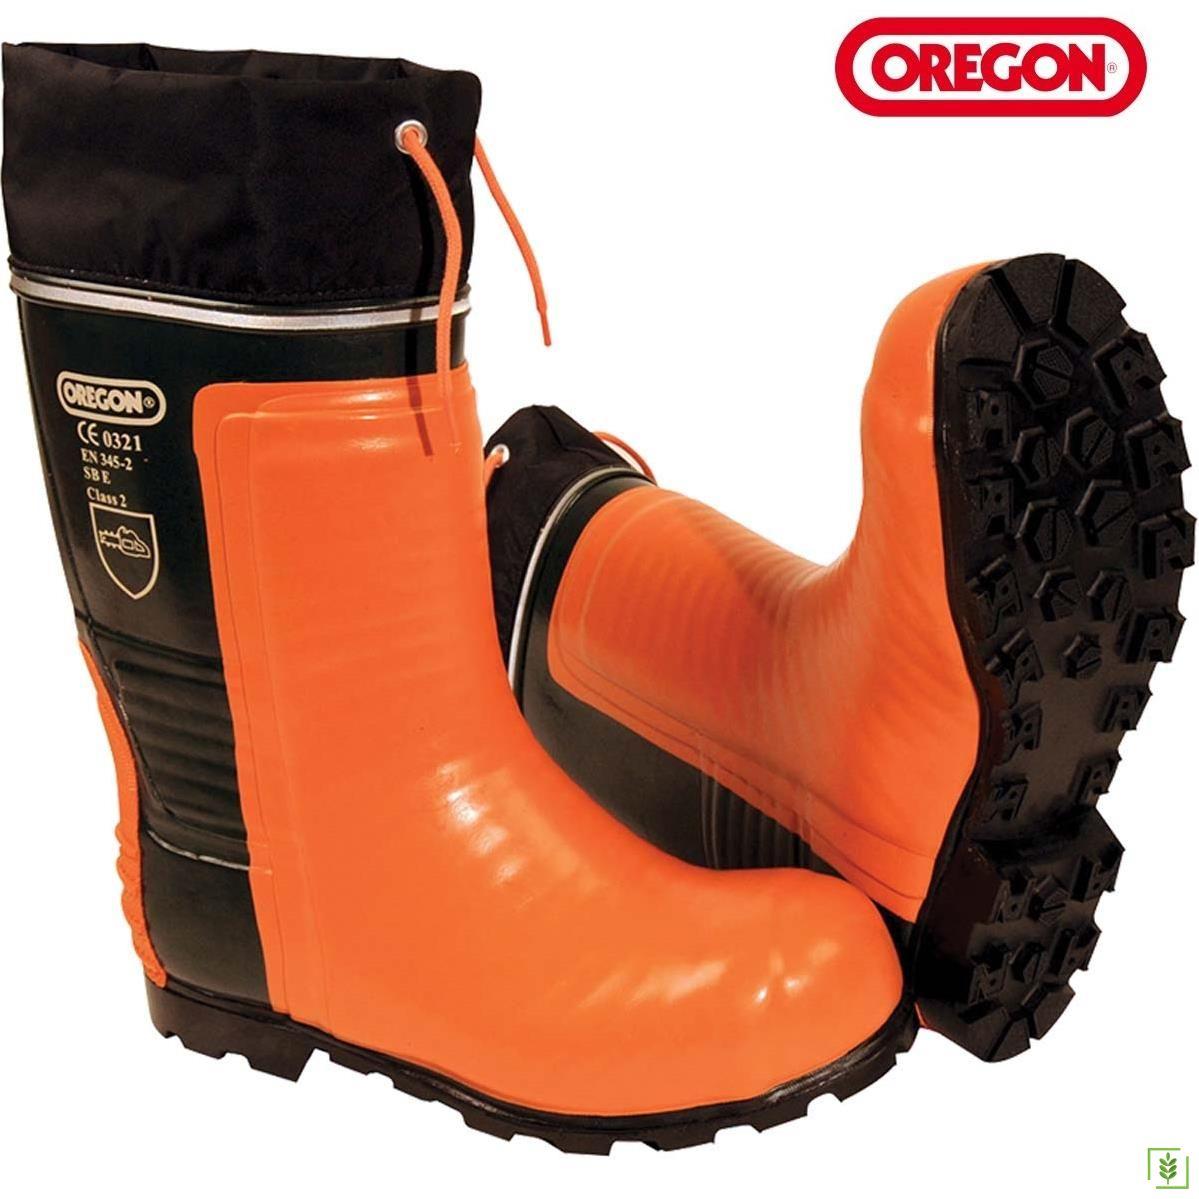 Oregon 295385/43 Zincir Kesmez Çizme 43 Numara